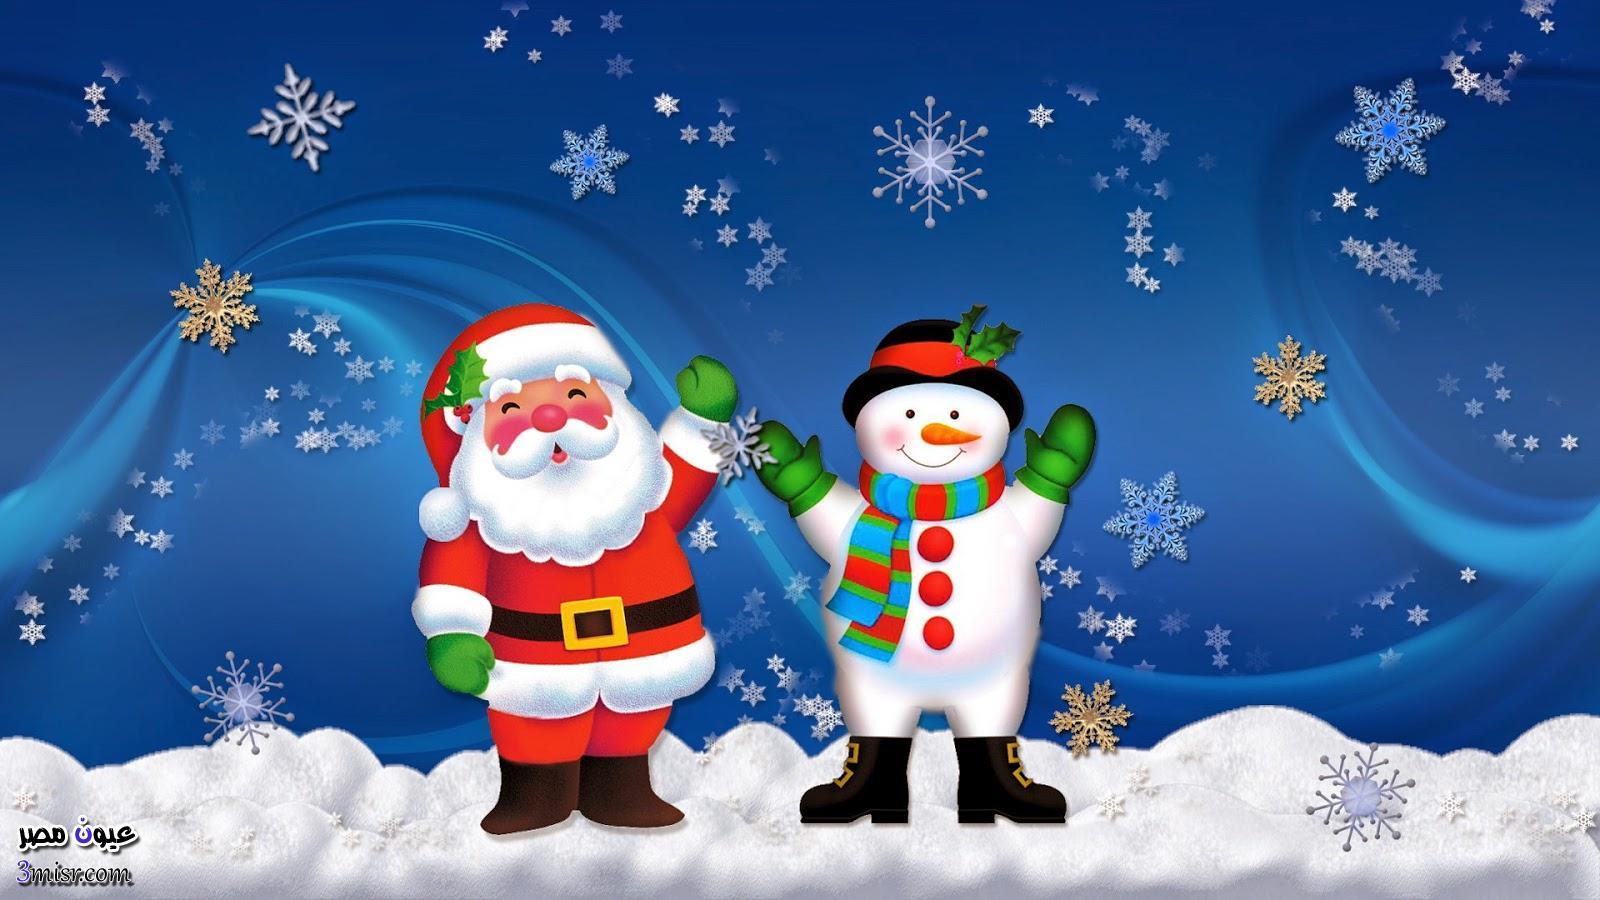 صور بابا نويل 2016 بالكريسماس